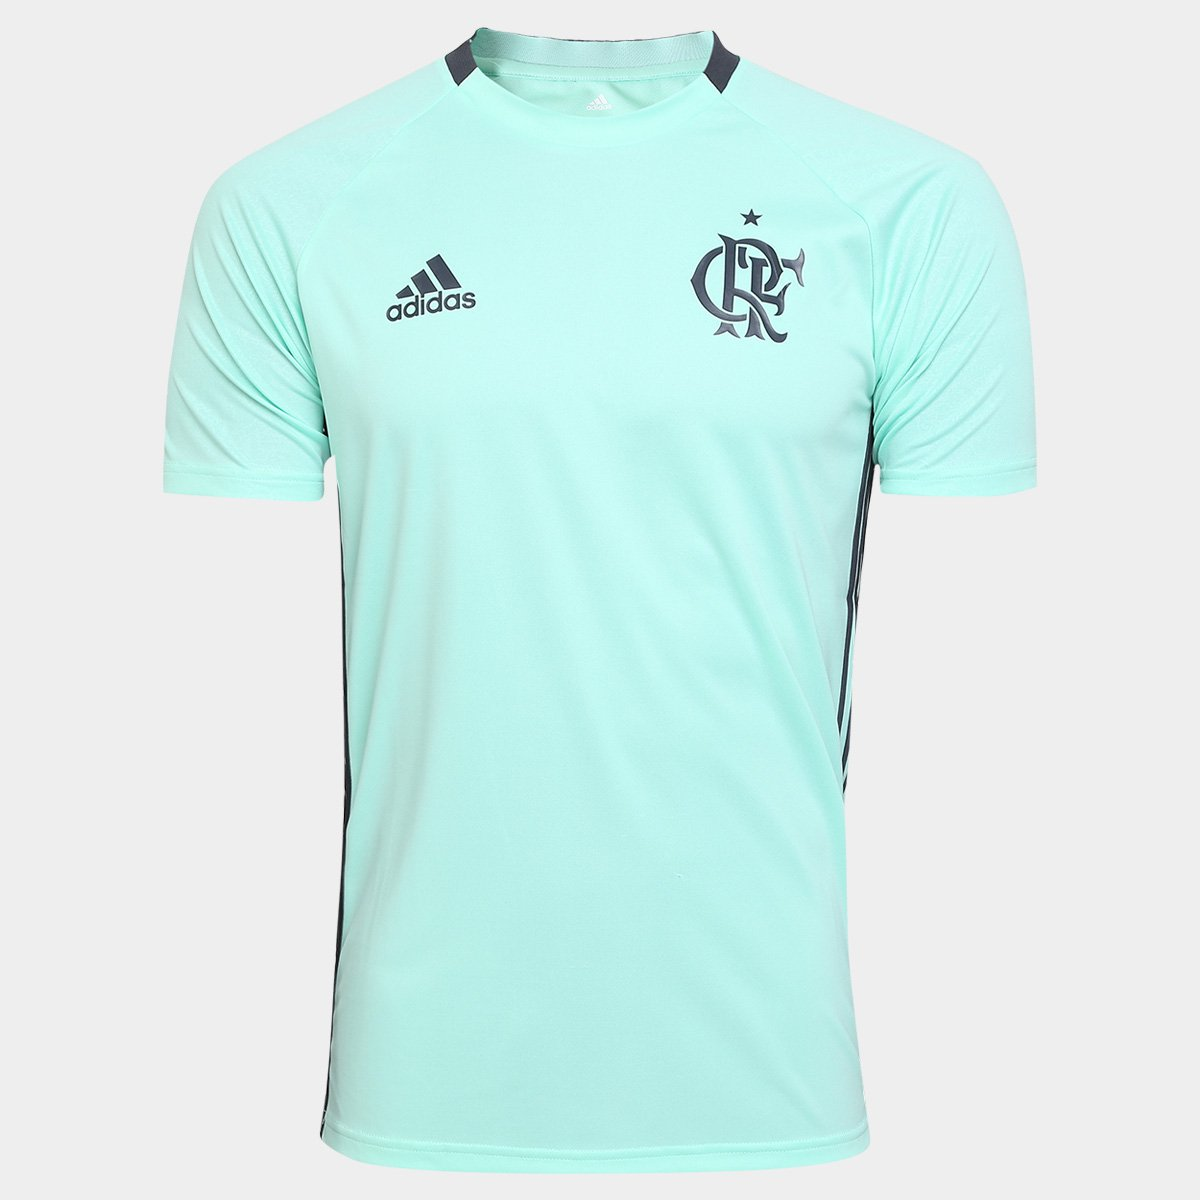 Camisa Flamengo 17 18 Treino Copa - Torcedor Adidas Masculina - Compre  Agora  49ffe978d4a5d